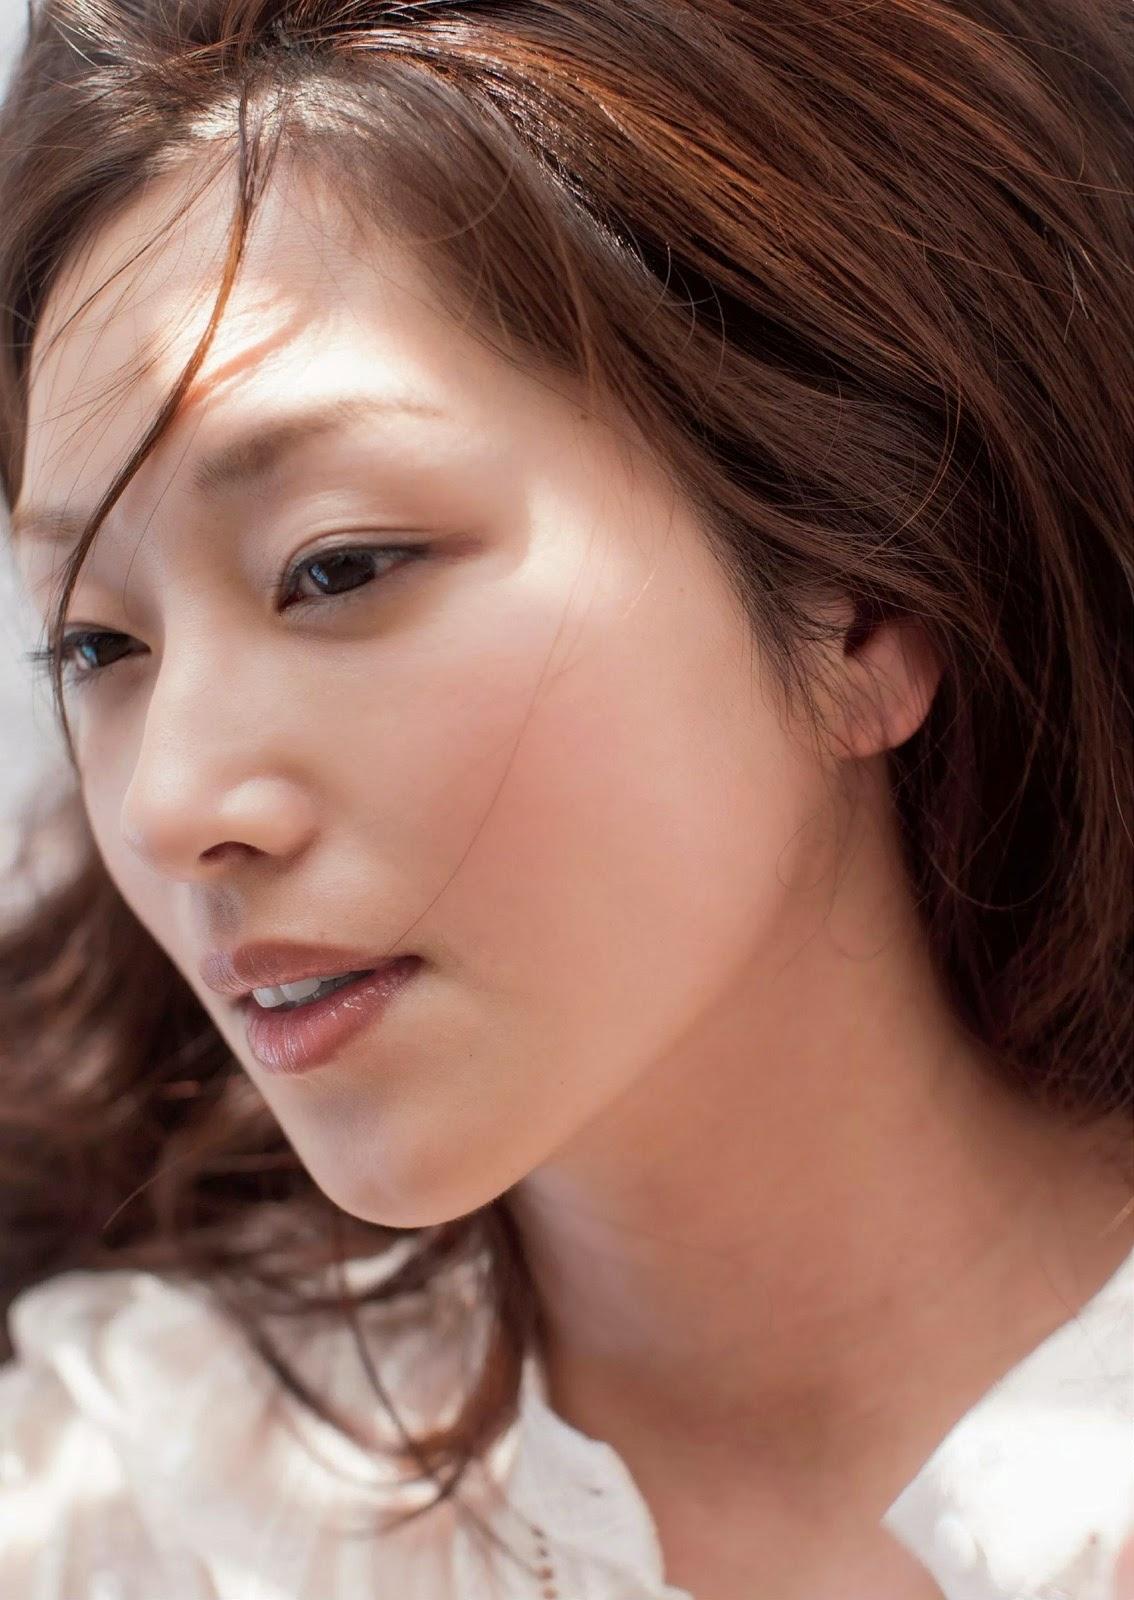 Fueki Yuko 笛木優子 유민 Weekly Playboy 週刊プレイボーイ April 2015 Pictures 5